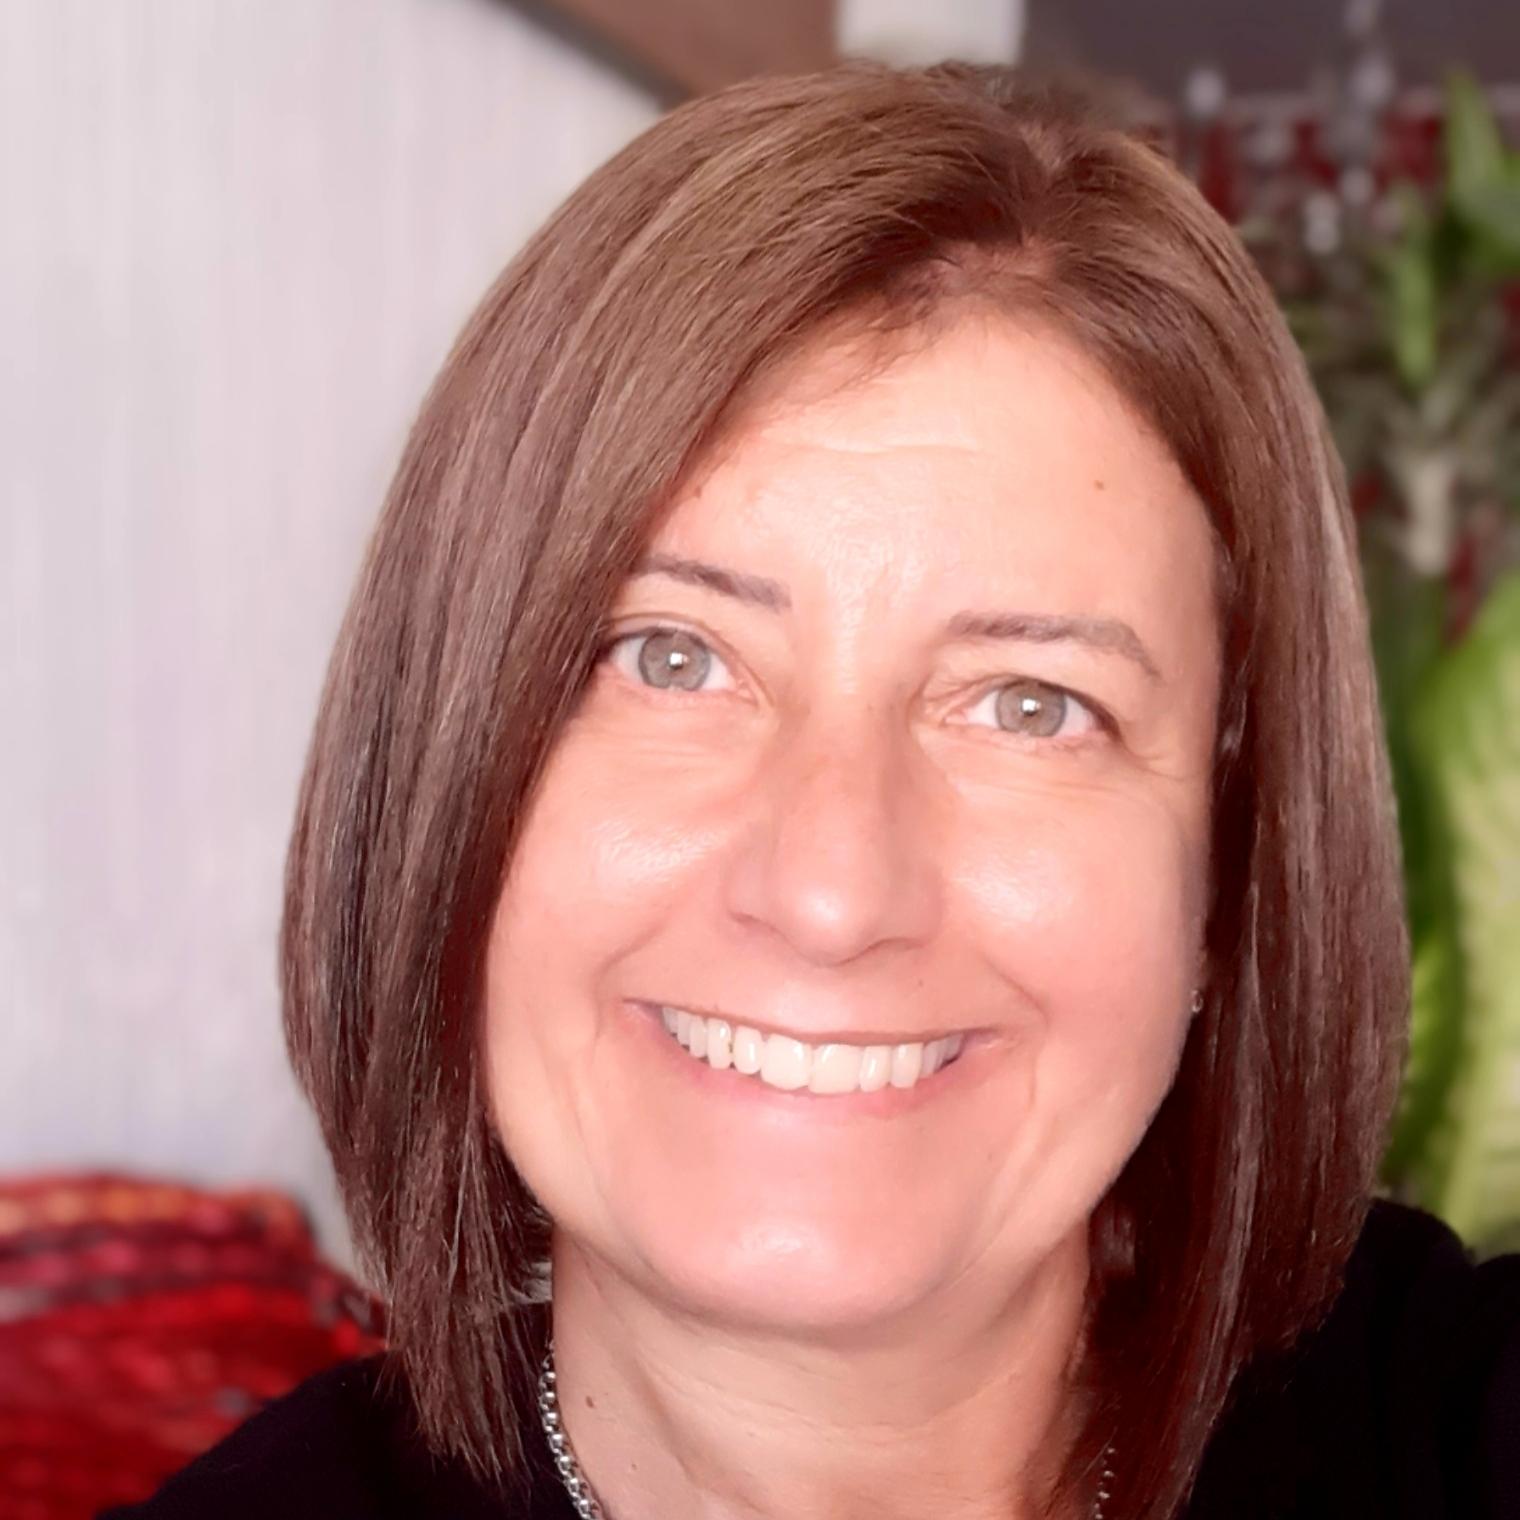 Mariella Sosa Detomasi